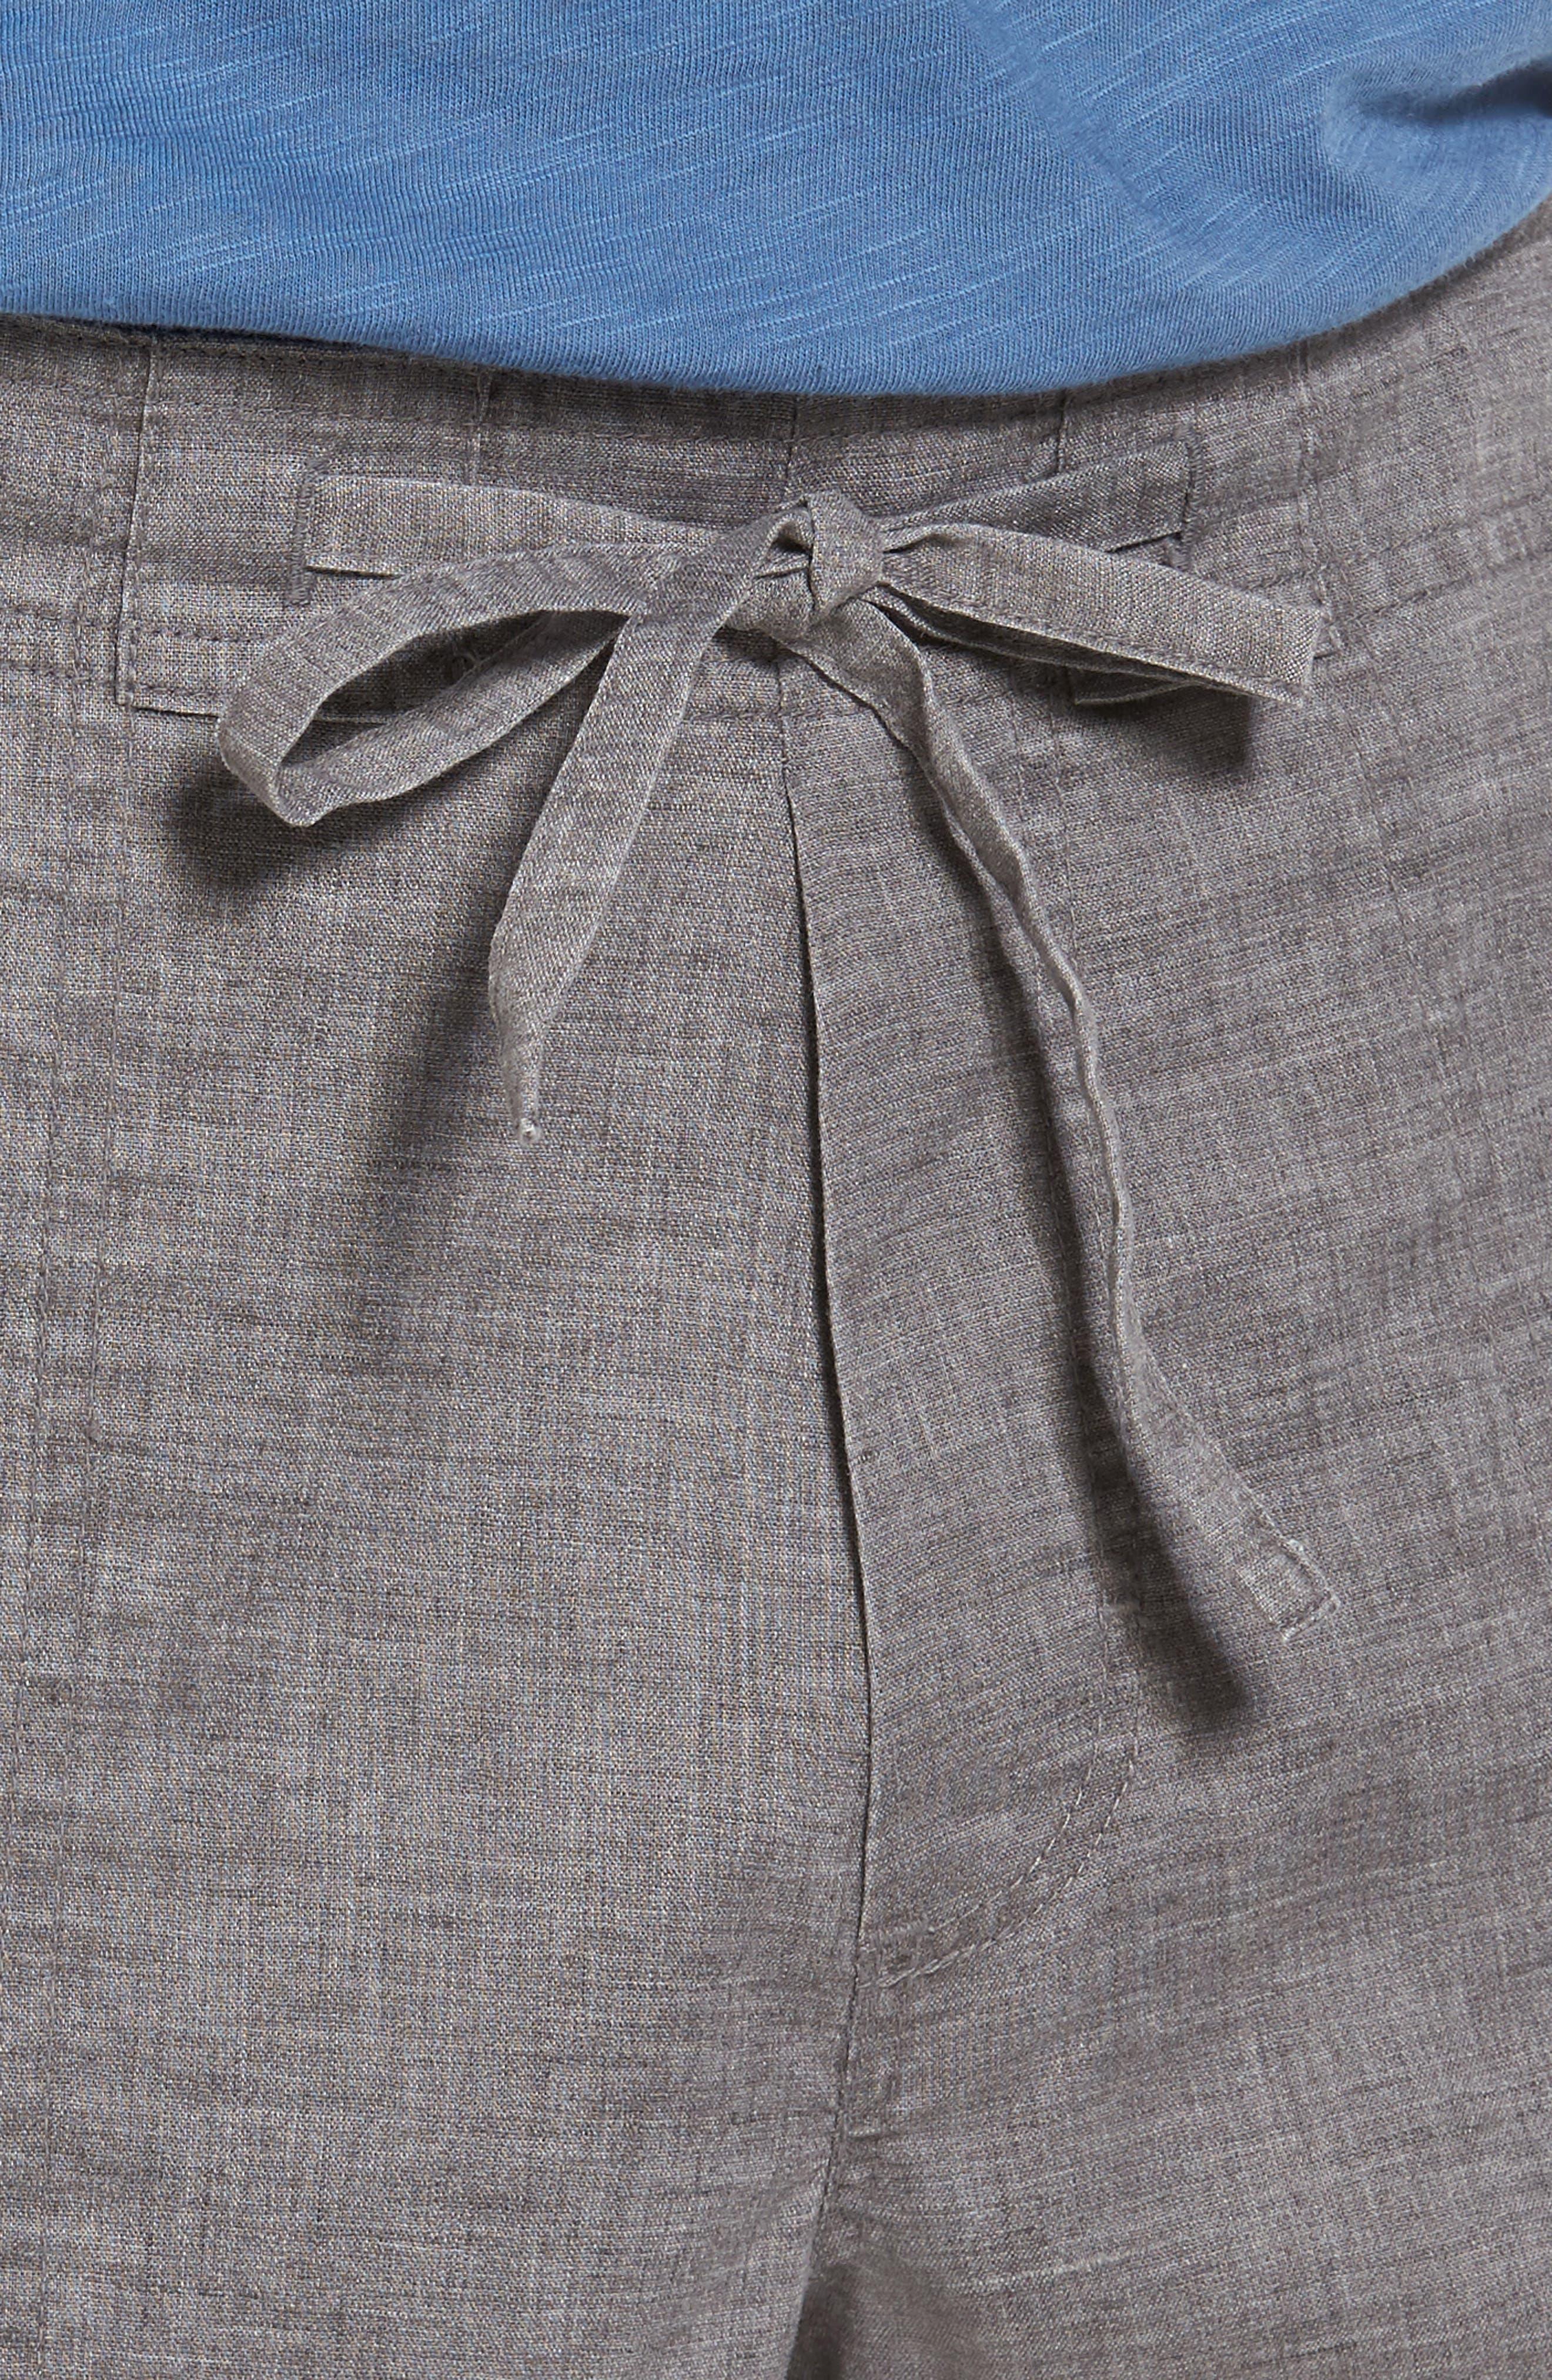 Sutra Shorts,                             Alternate thumbnail 4, color,                             Gravel